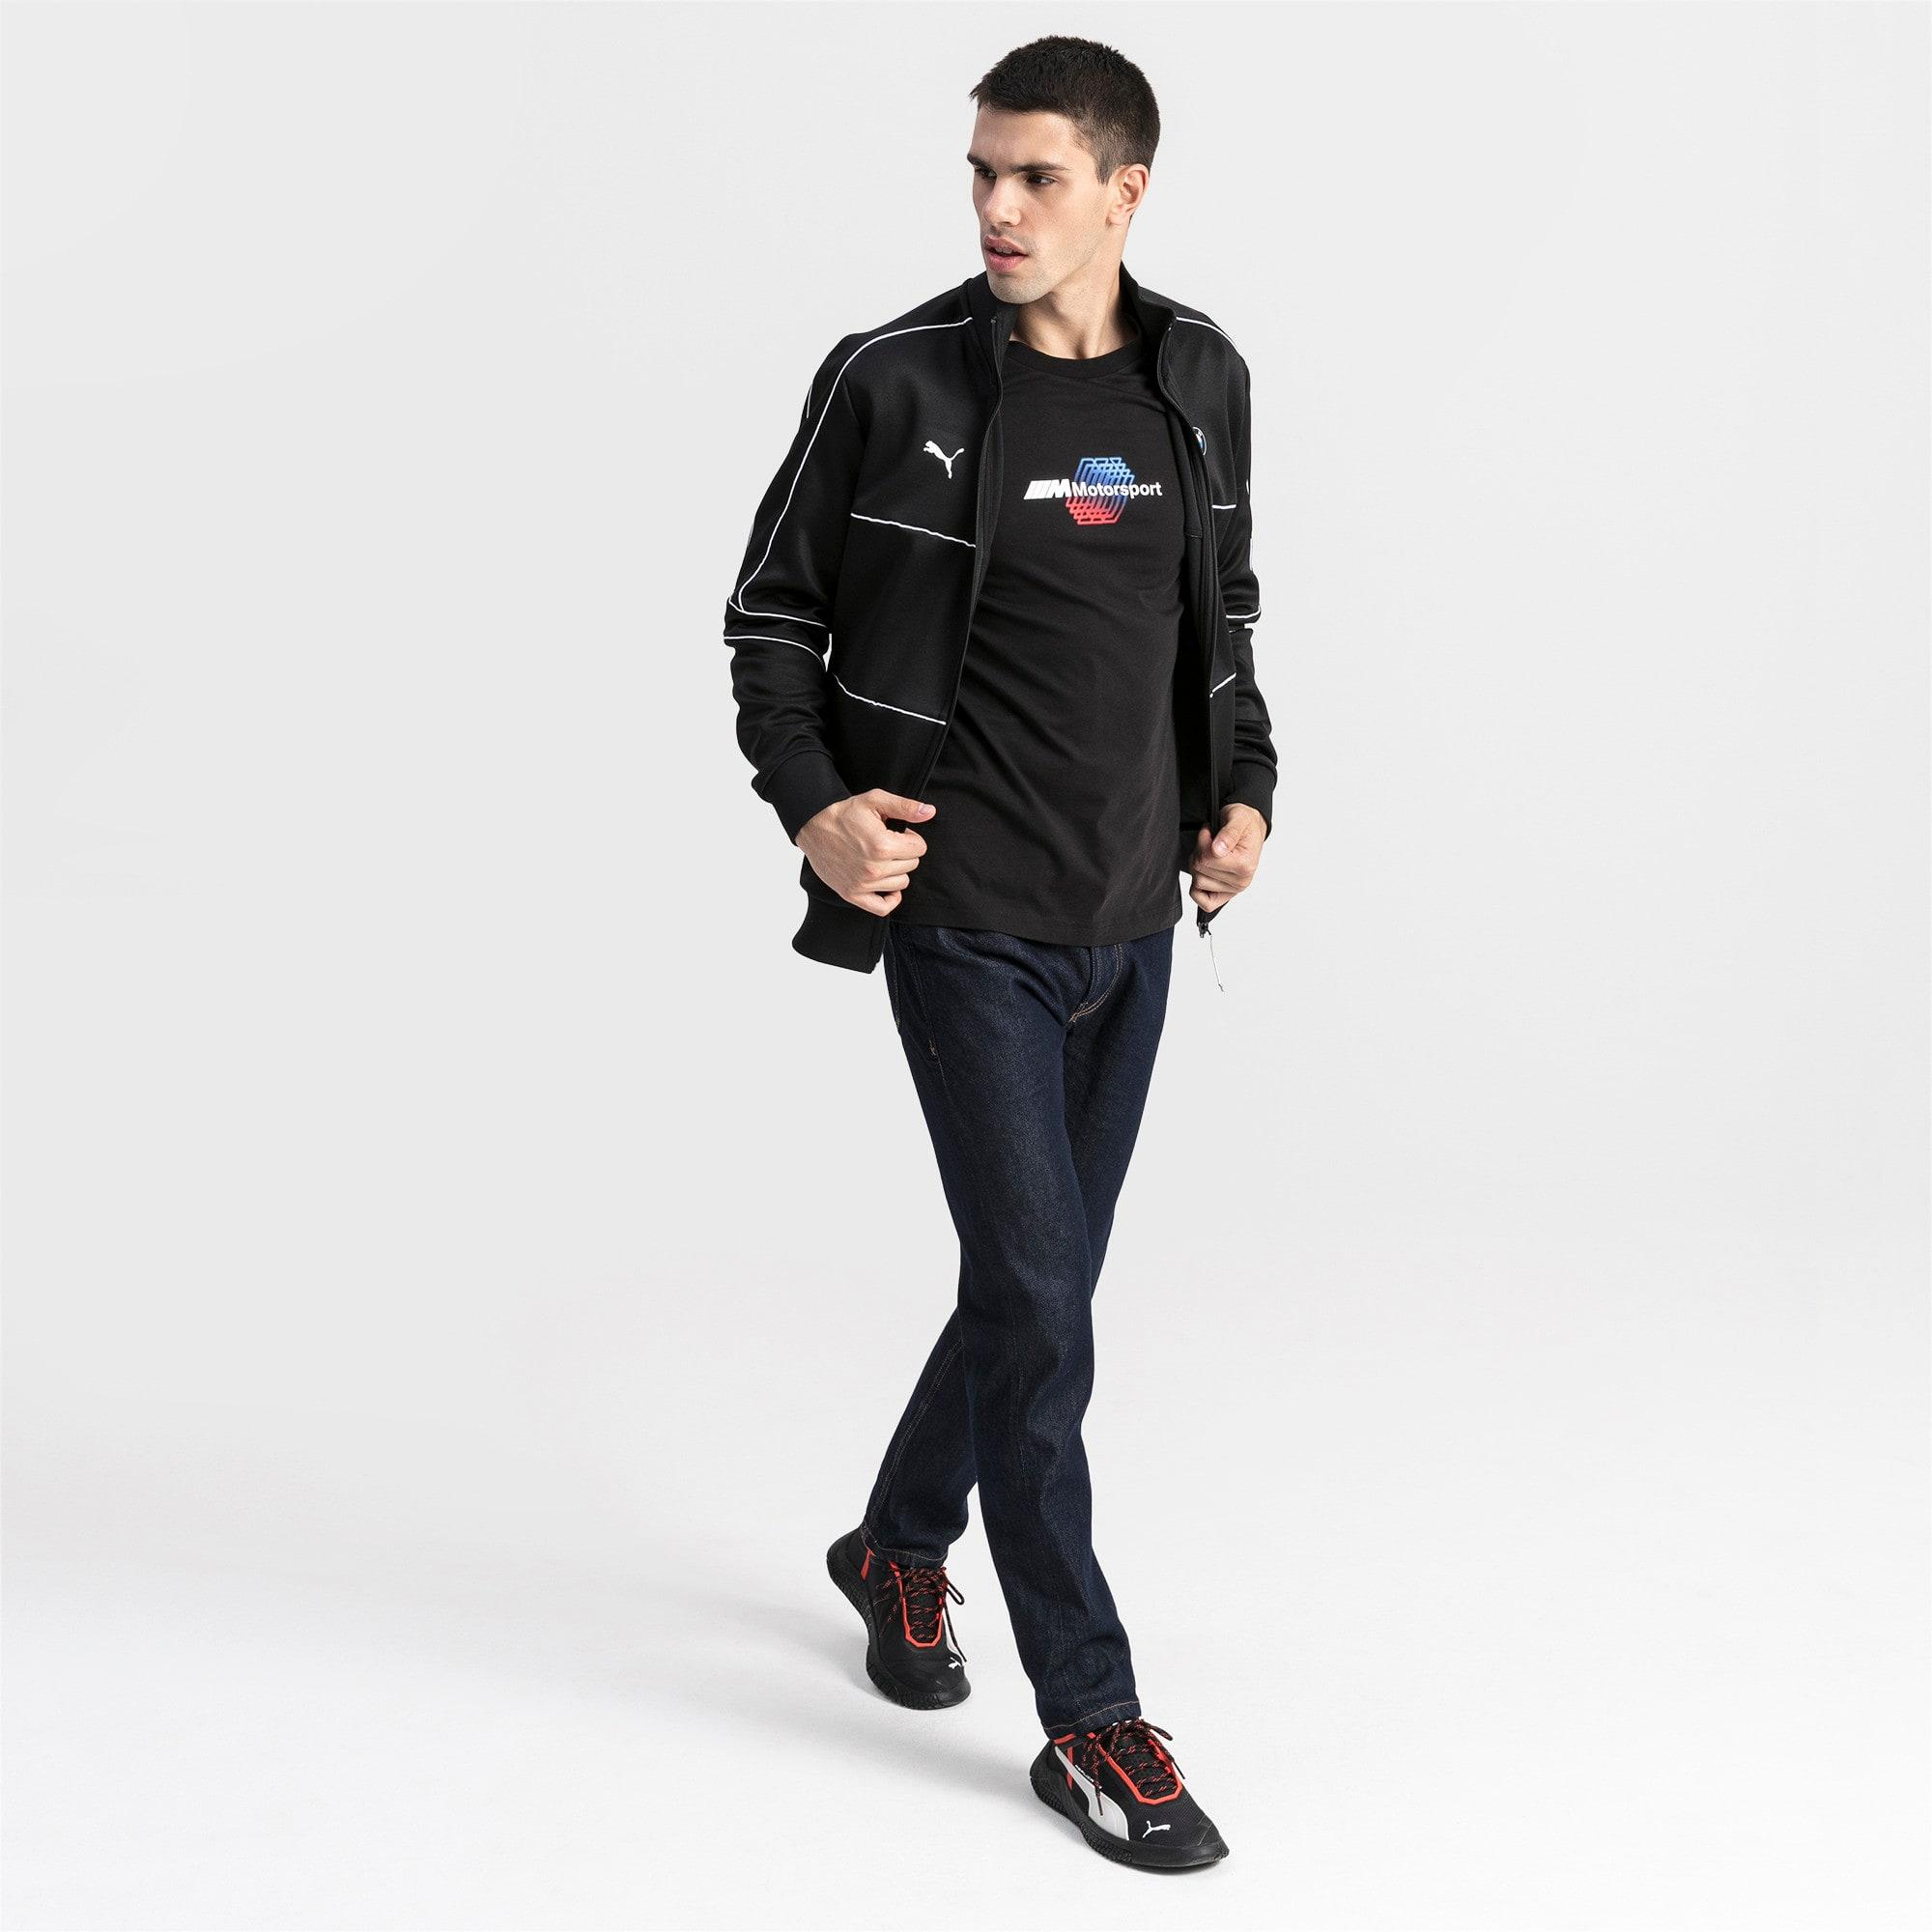 Thumbnail 3 van BMW M Motorsports logo-T-shirt voor mannen, Puma Black, medium